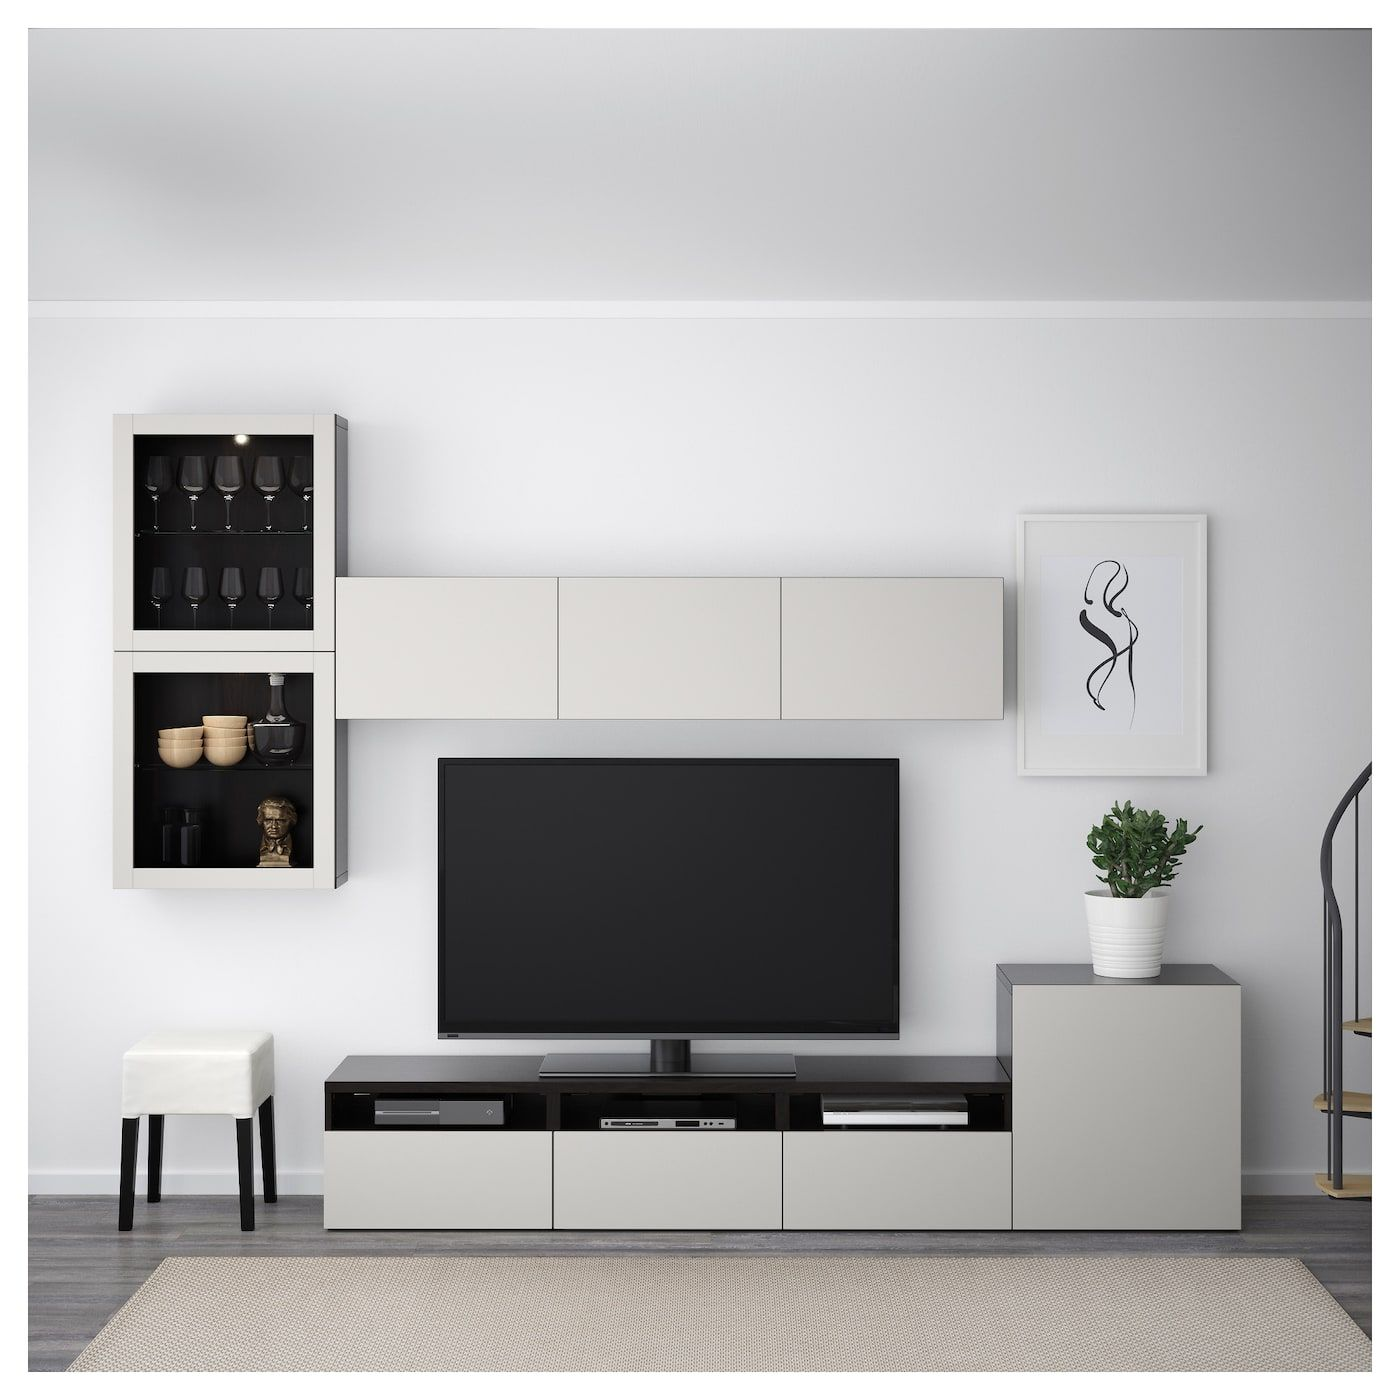 Besta Tv Storage Combination Glass Doors Black Brown Lappviken Light Gray Clear Glass 118 1 8x7 7 8 15 3 4x83 1 8 300x20 40x211 Cm Living Room Tv Living Room Tv Wall Tv Storage